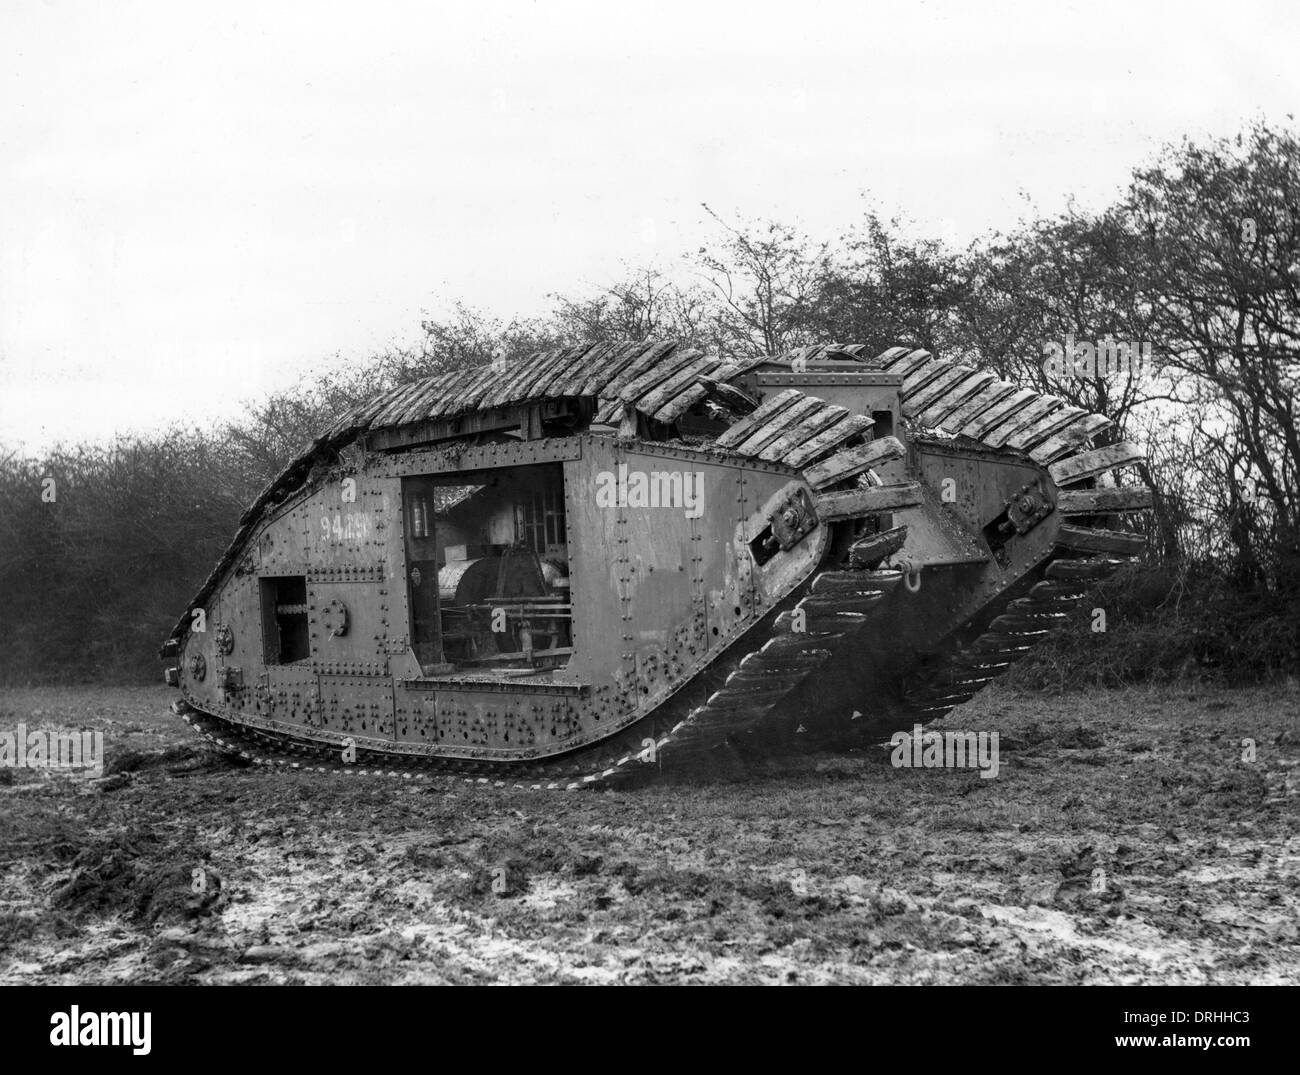 experiment-with-british-mark-v-tank-ww1-